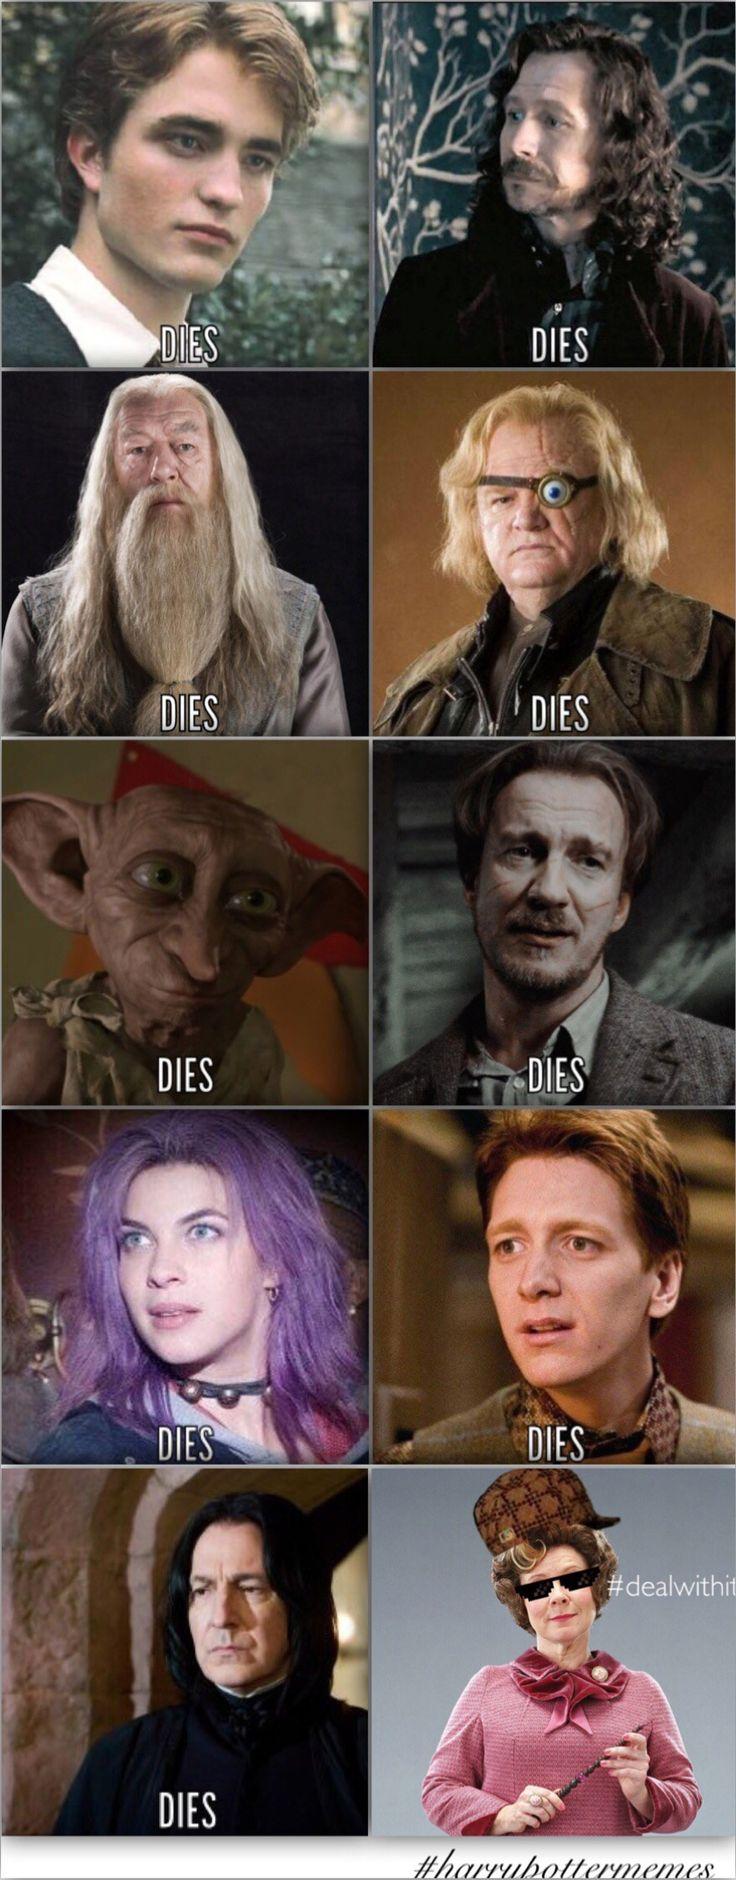 harrypottermemes  Harry potter in 2019  Harry potter memes Harry Potter Harry potter sad